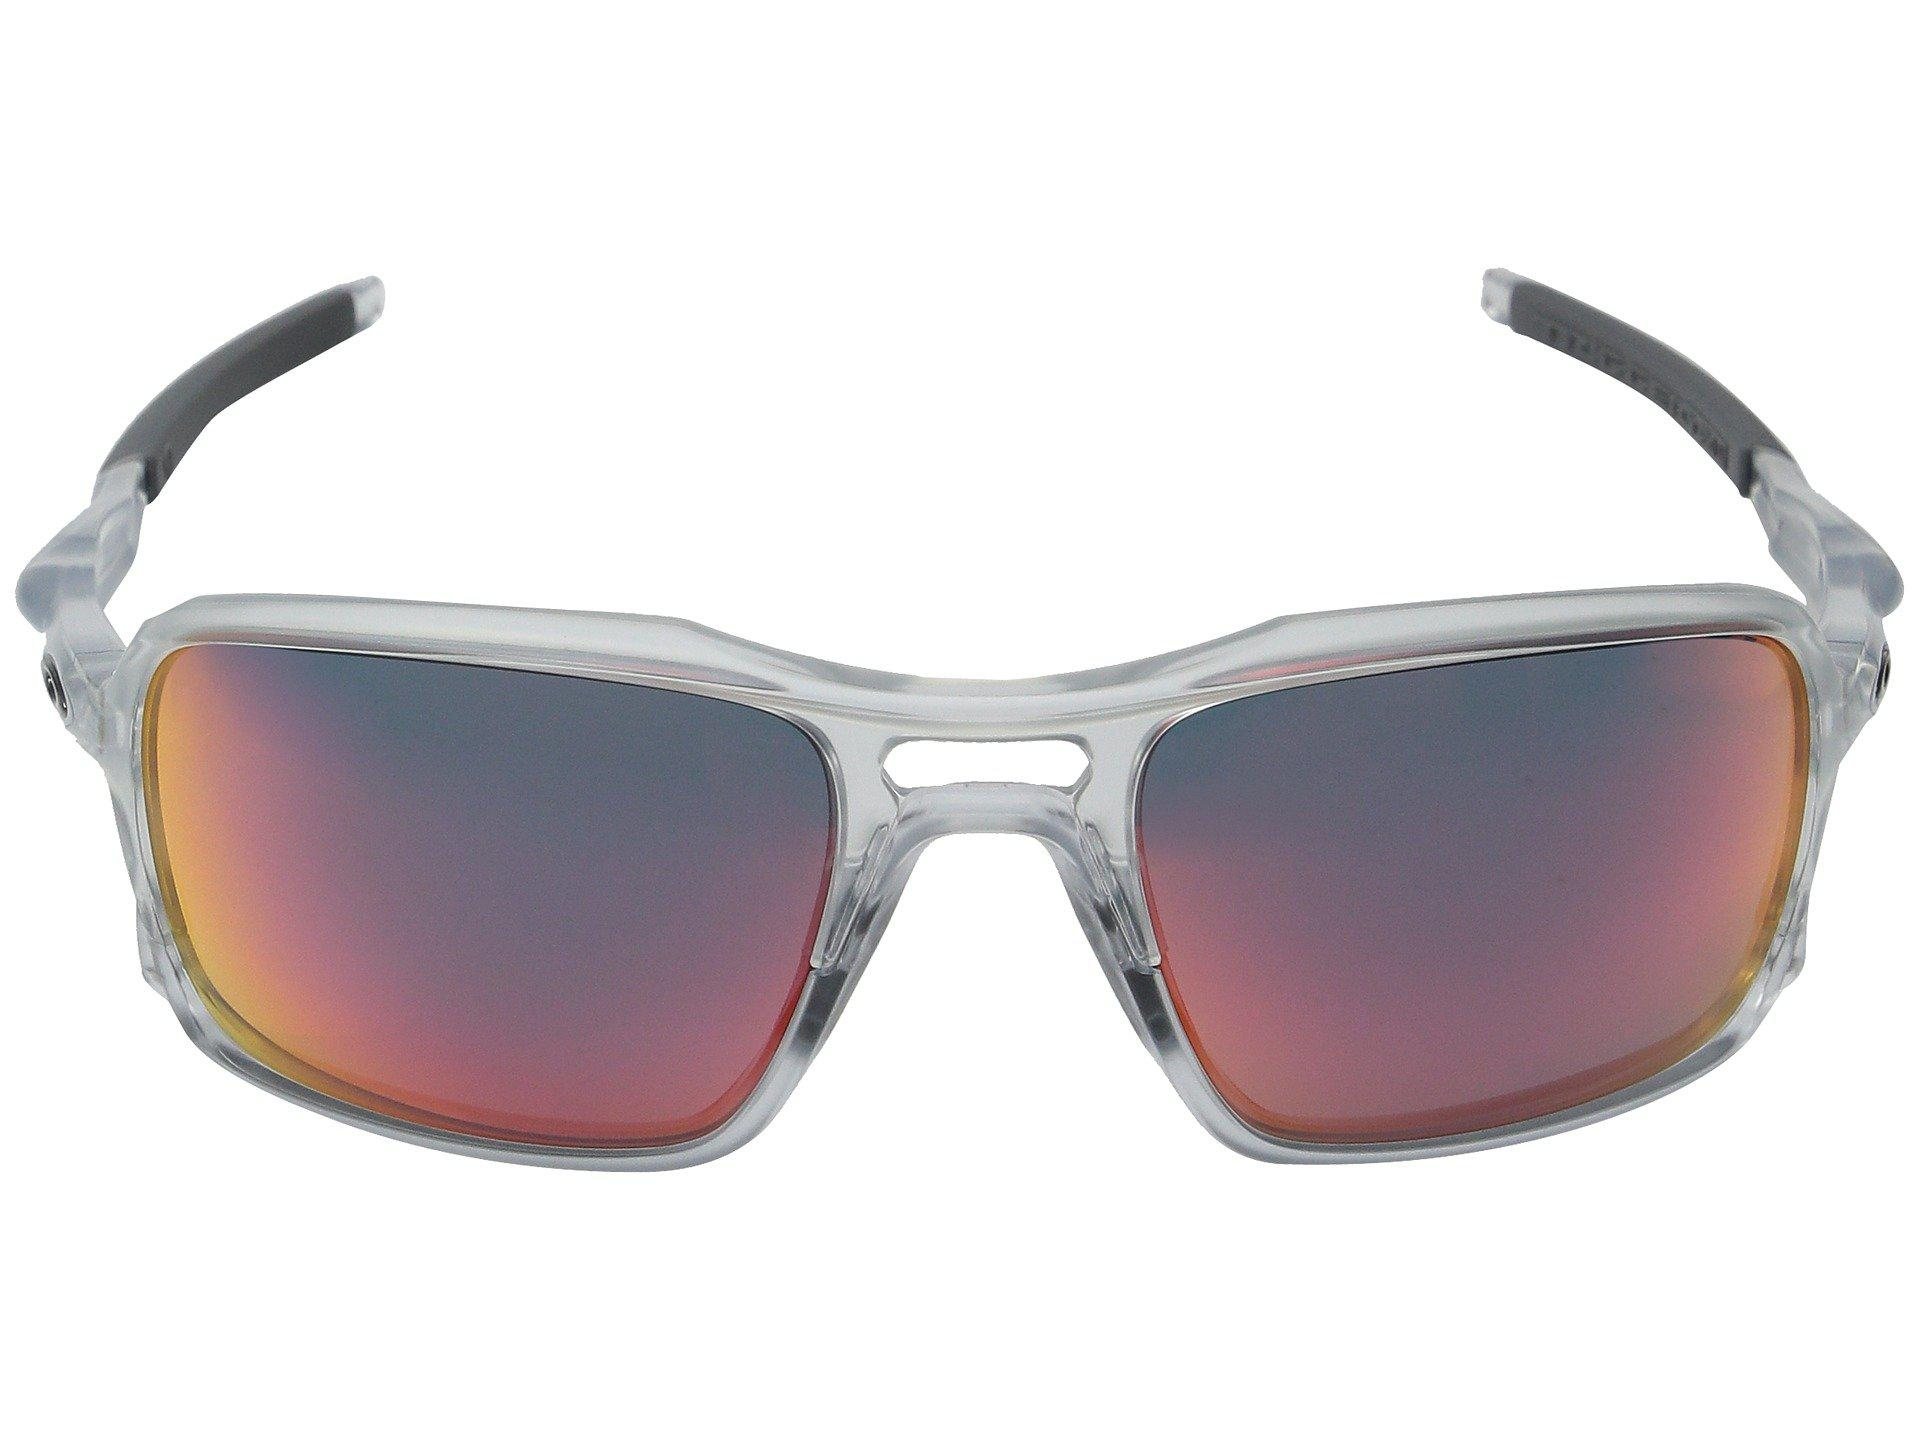 a6fe627cf78e Gallery. Previously sold at: 6PM · Men's Oakley Jupiter Men's Cat Eye  Sunglasses ...